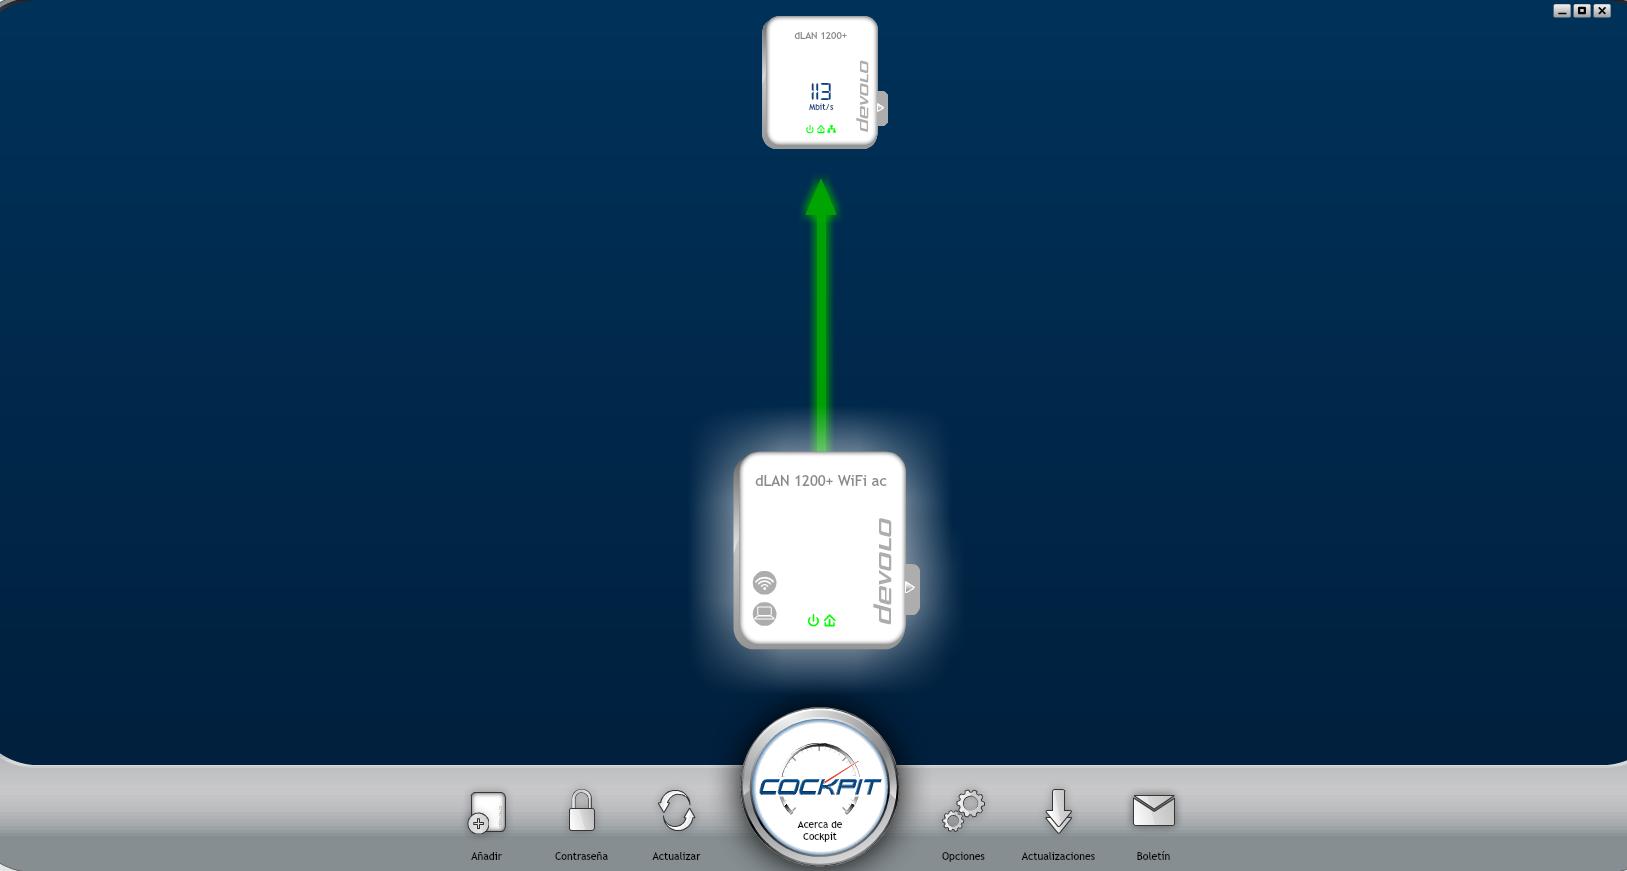 devolo dlan 1200 WiFi Starter Kit Análisis Cockpit